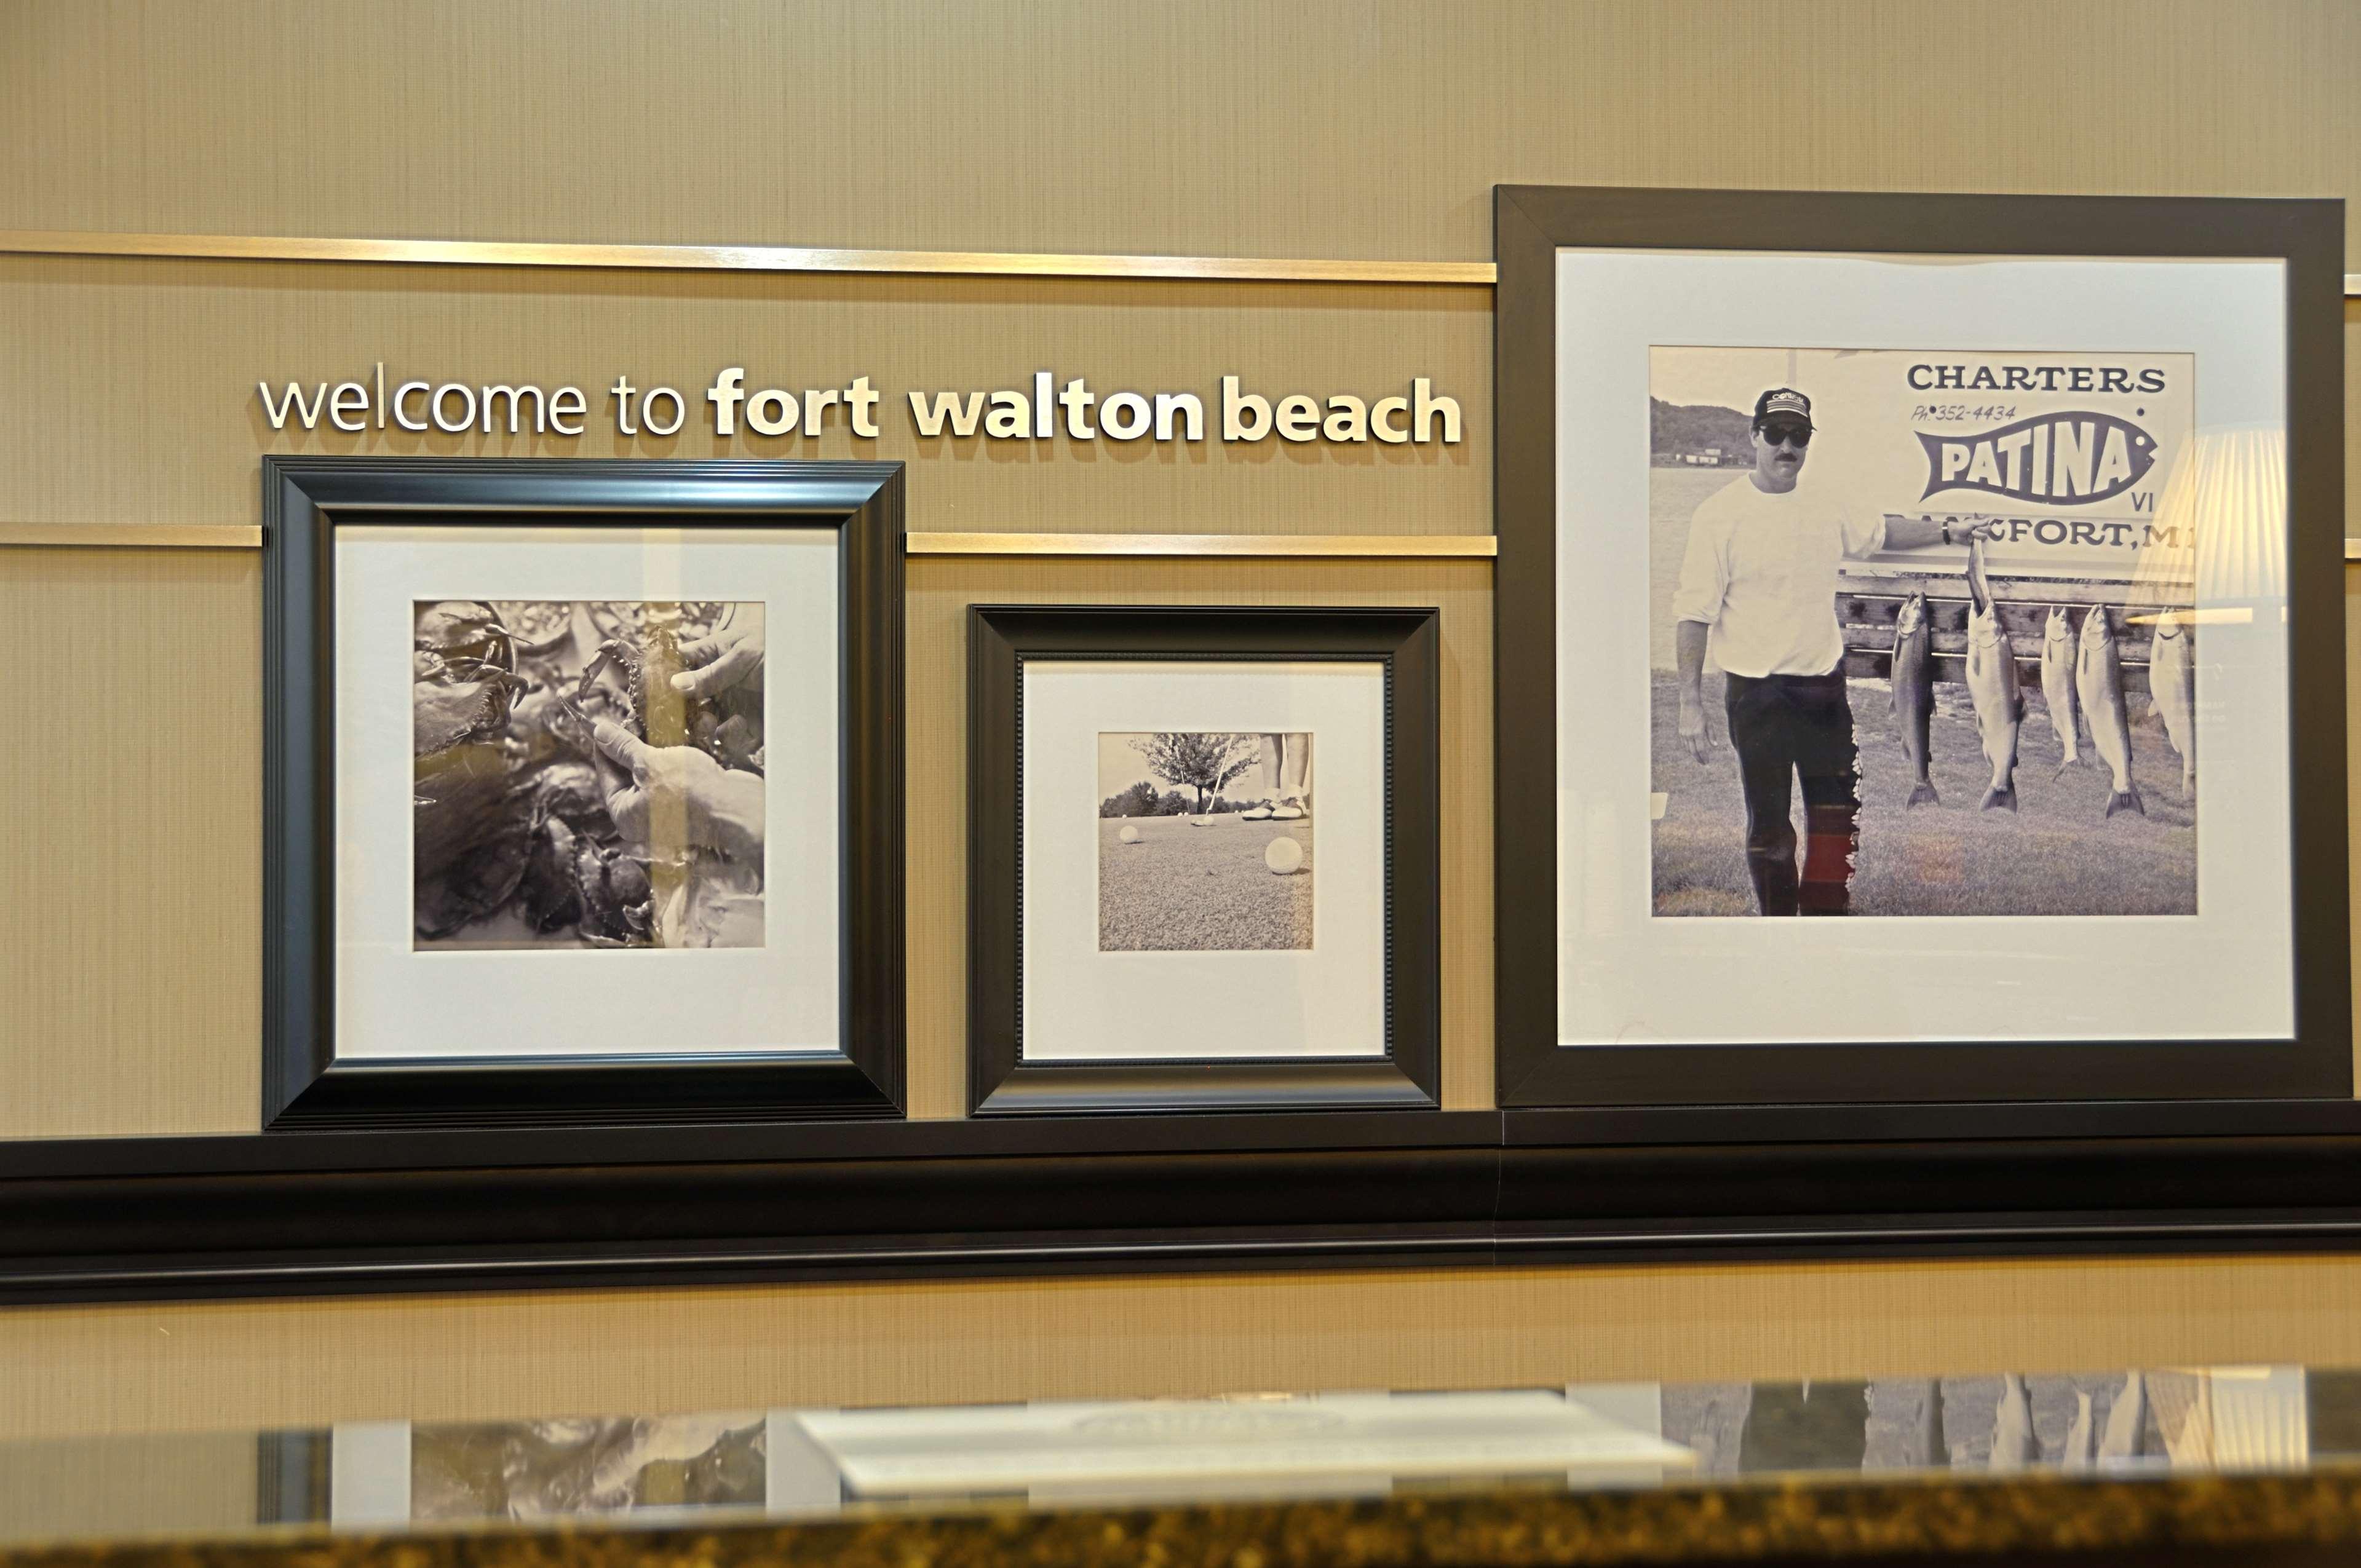 Hampton Inn Ft. Walton Beach image 0